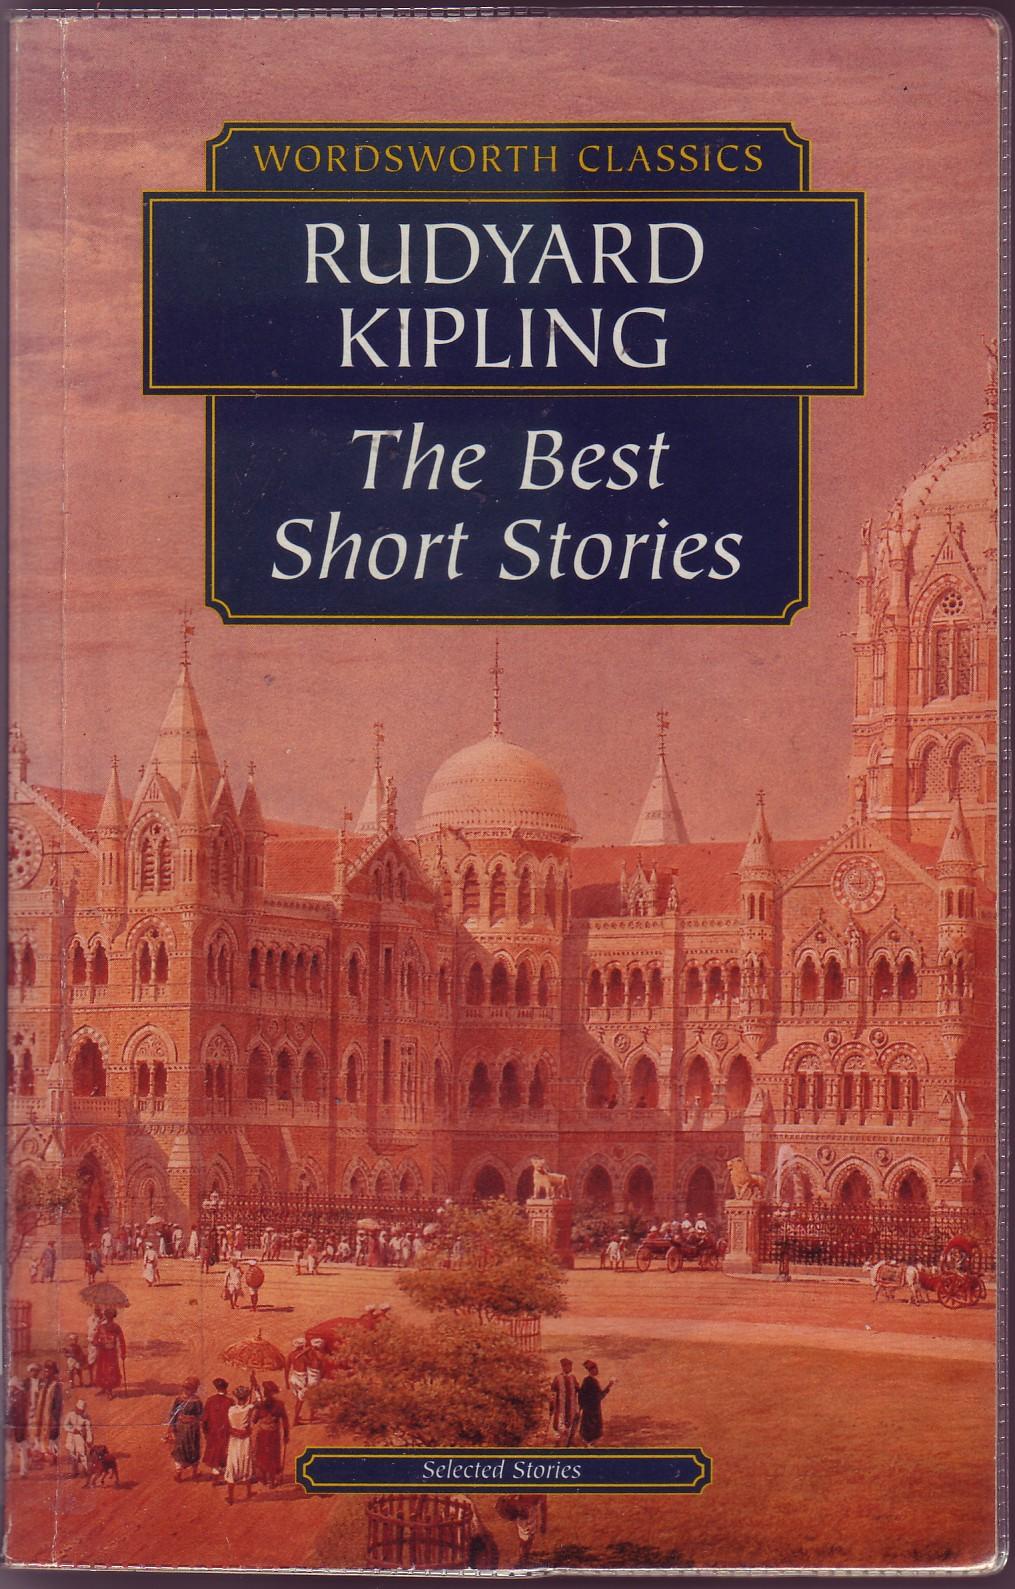 [kipling]